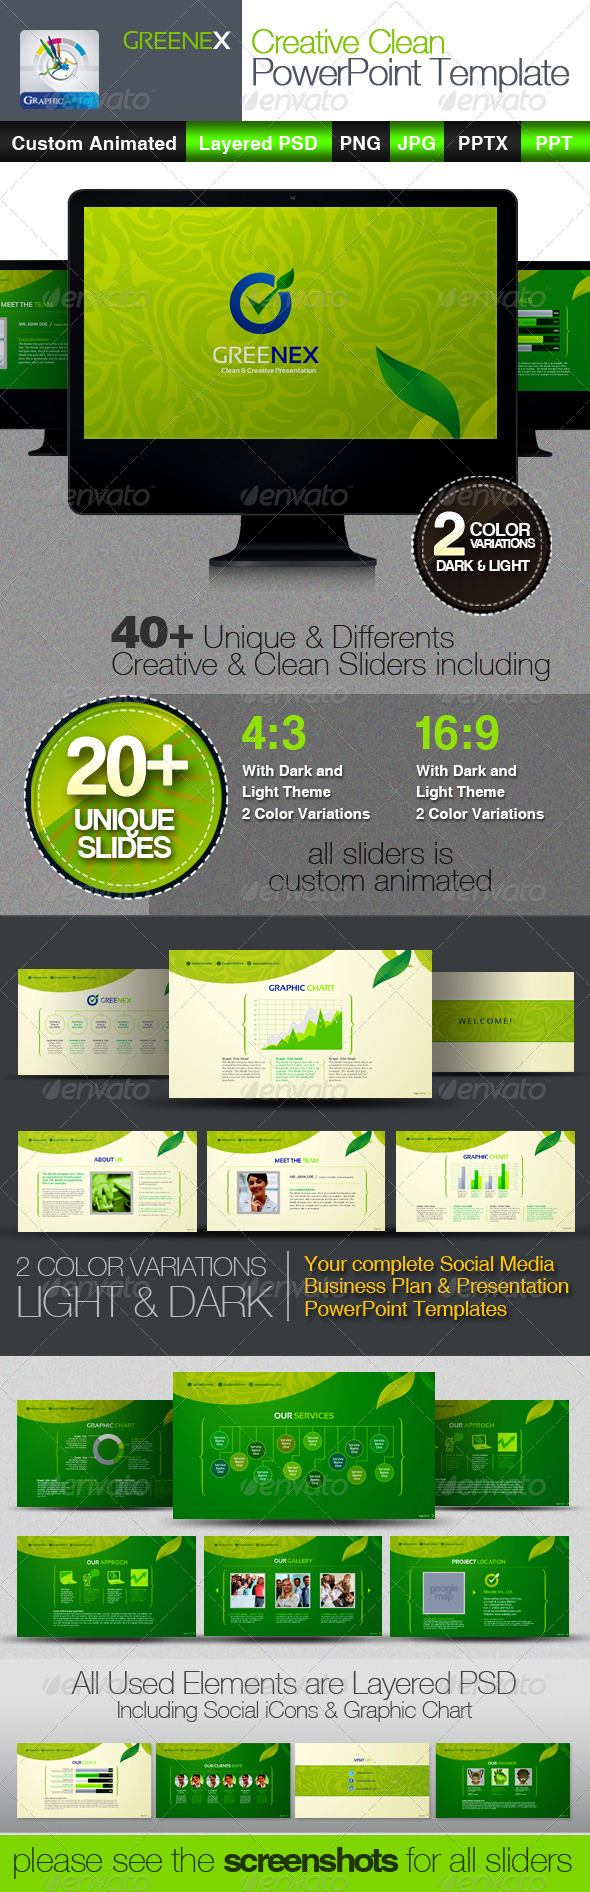 GraphicRiver Greenex Creative PowerPoint Templates 3654165